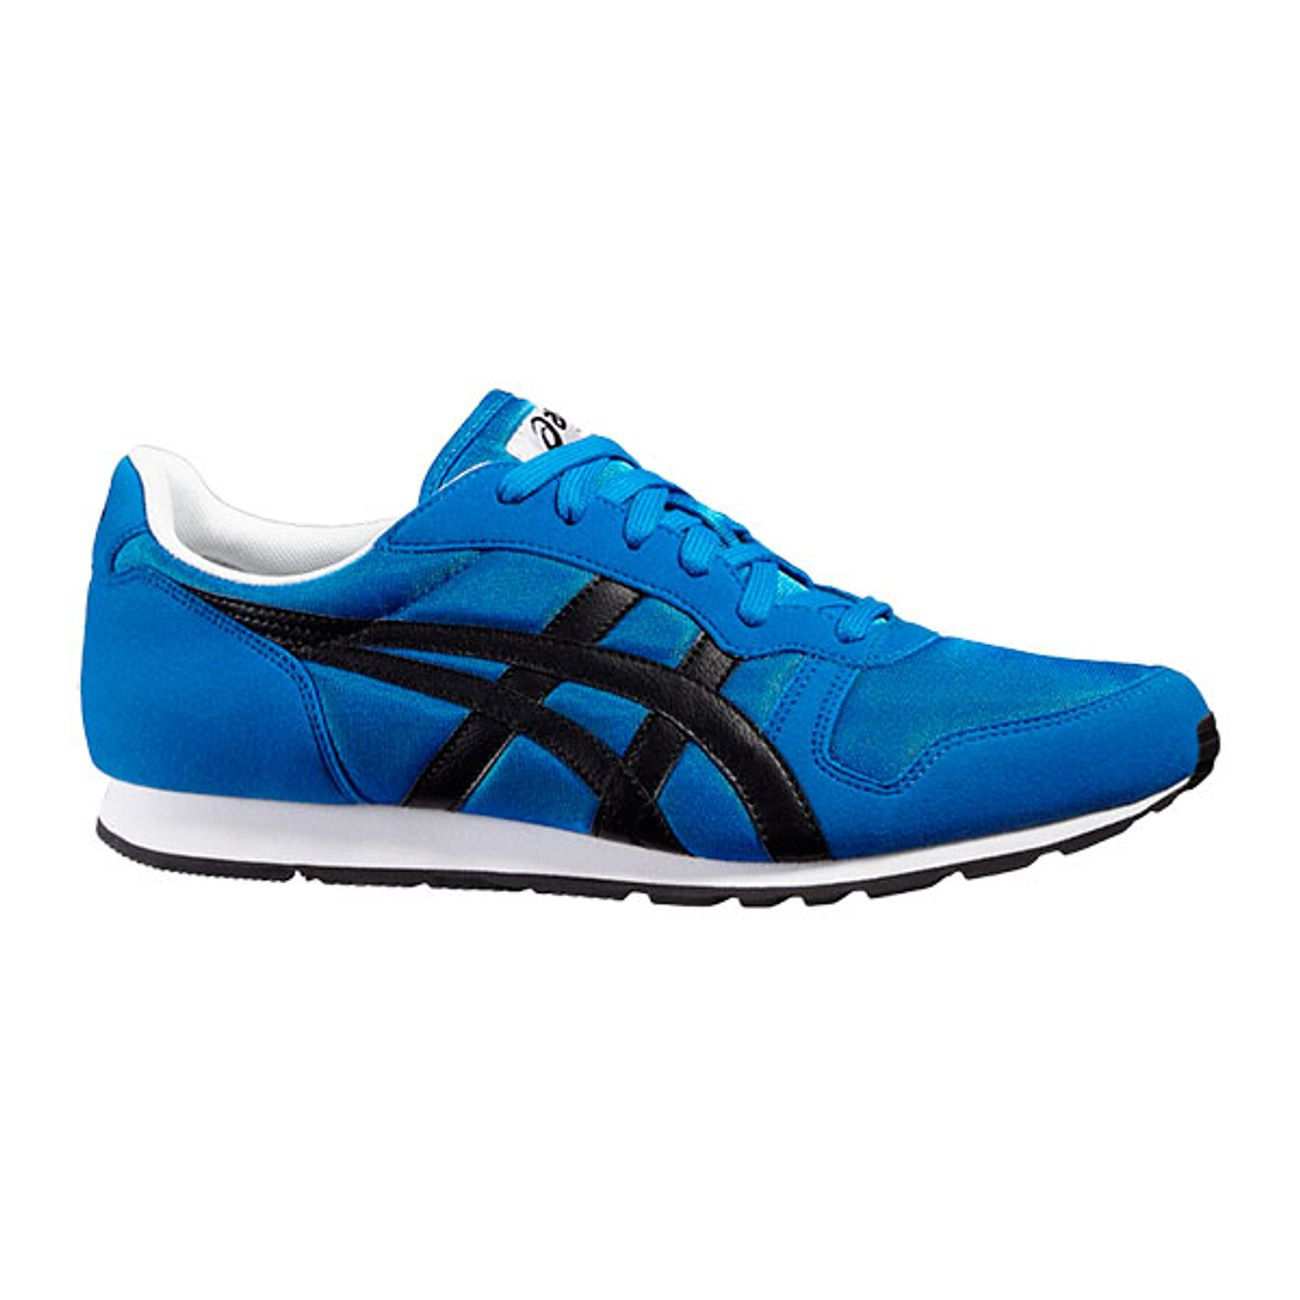 Hn6g2 Racer Temp Running Bleue 4290 Adulte Asics hsdrtQC